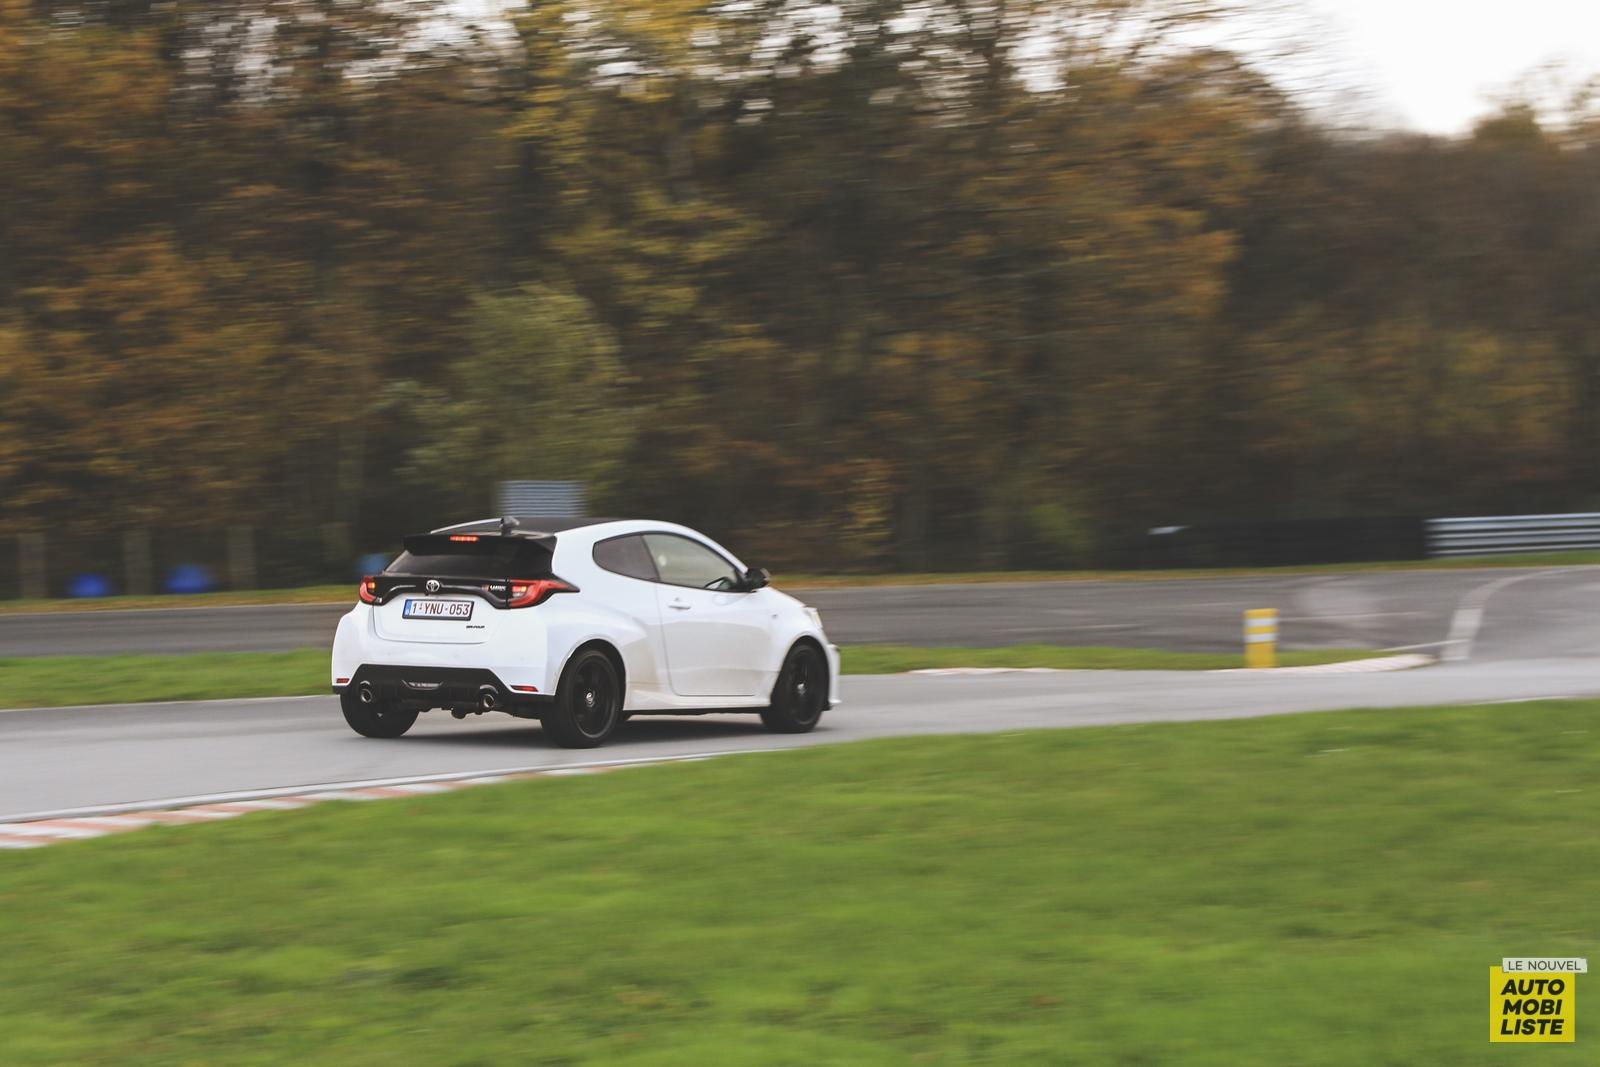 Essai Toyota Yaris GR LeNouvelAutomobiliste 264 48